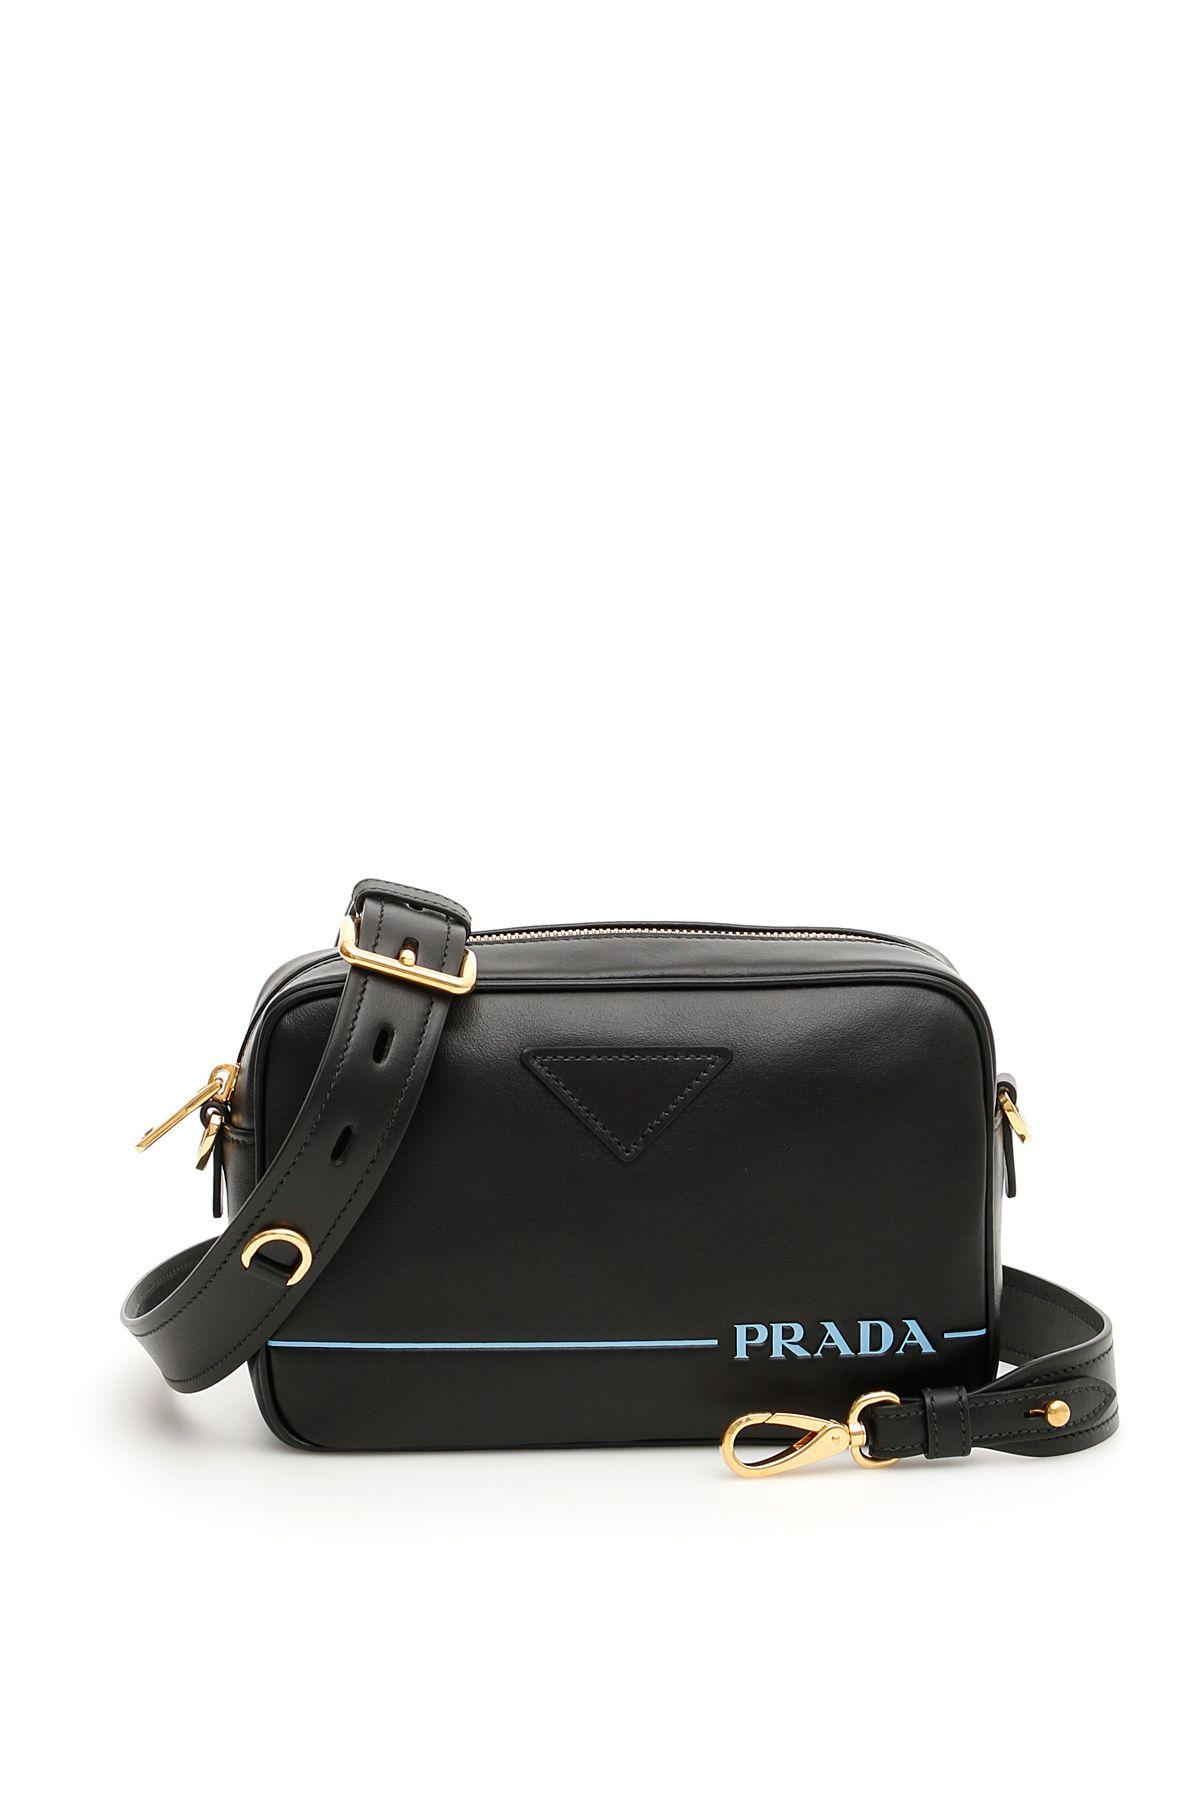 5bad85da19e9 Prada Prada Mirage Camera Bag - NERO (Black) - 10962120 | italist